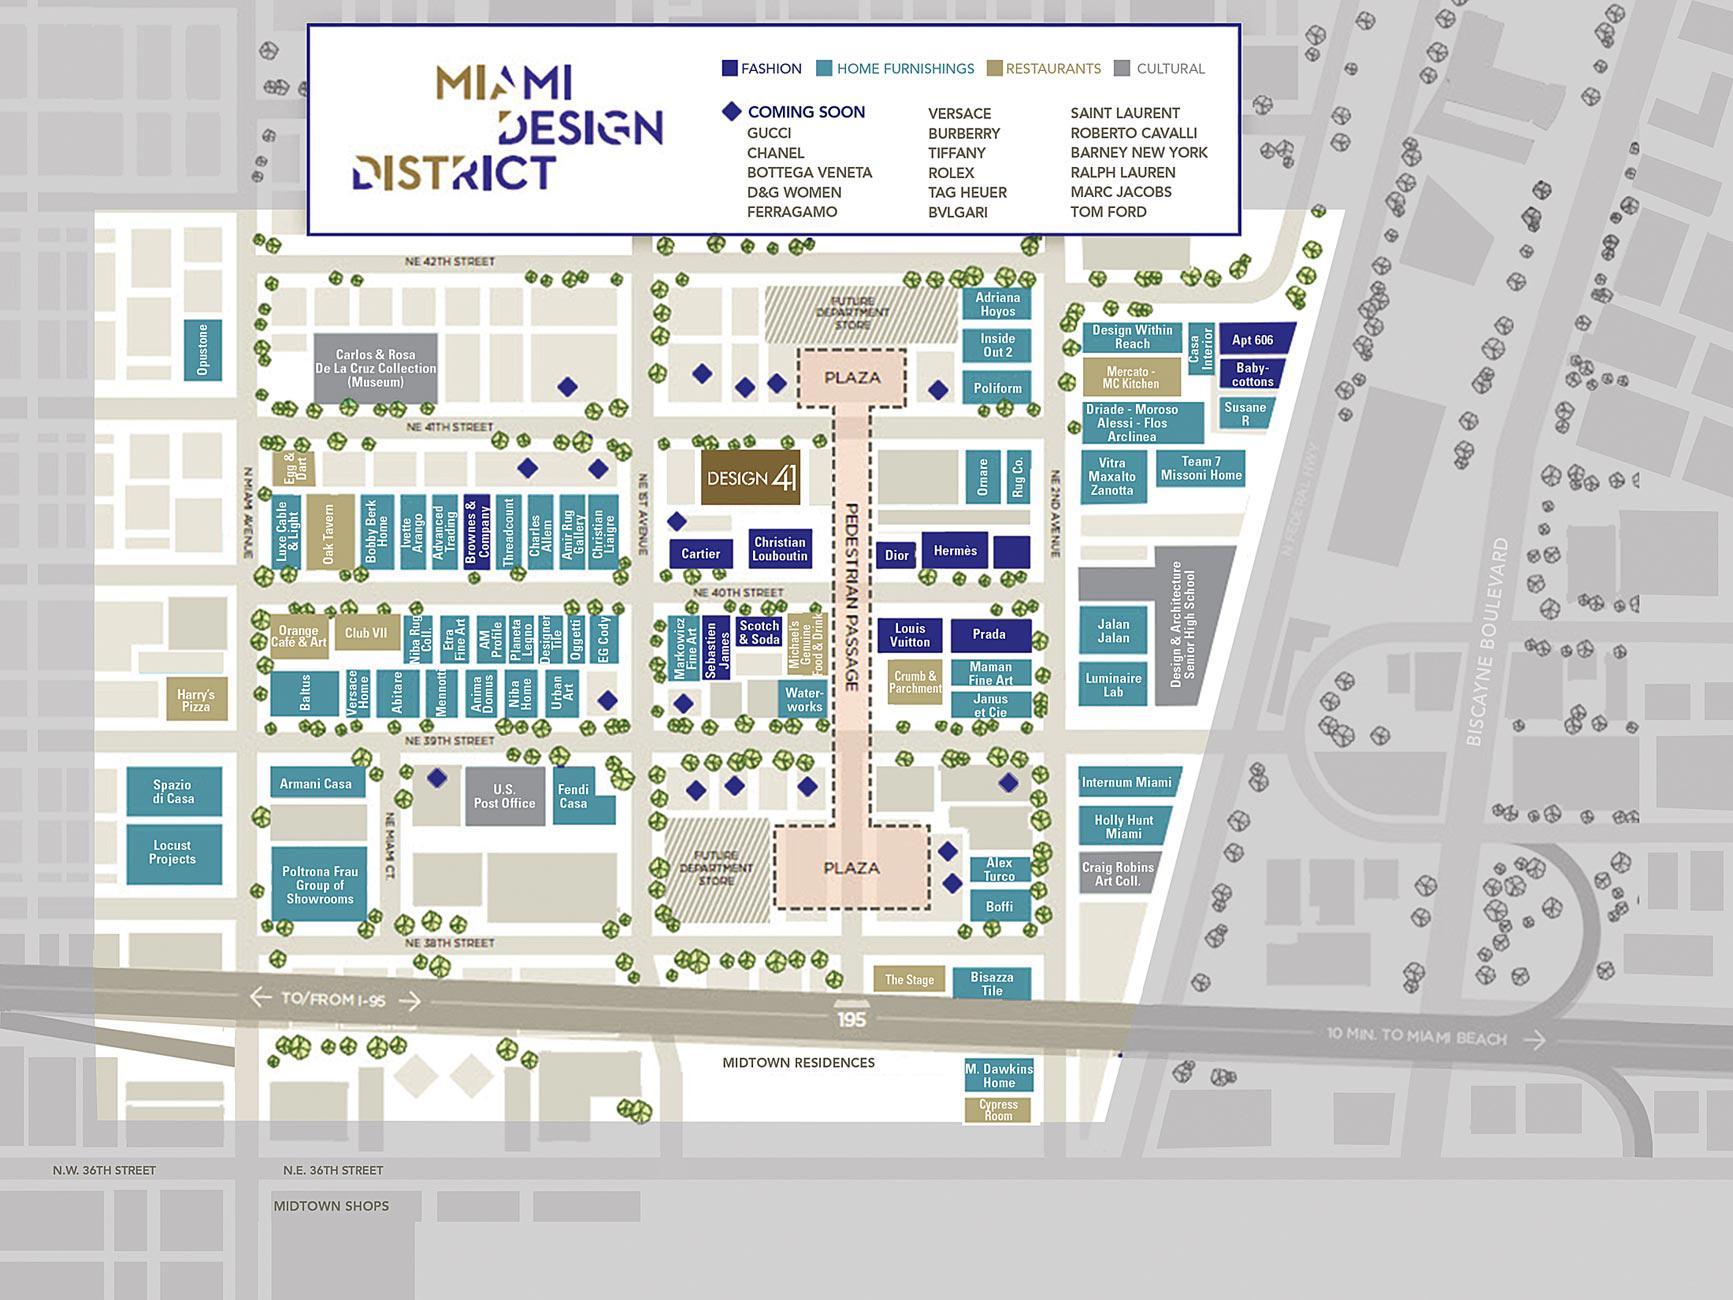 miami design district map map of miami design district florida